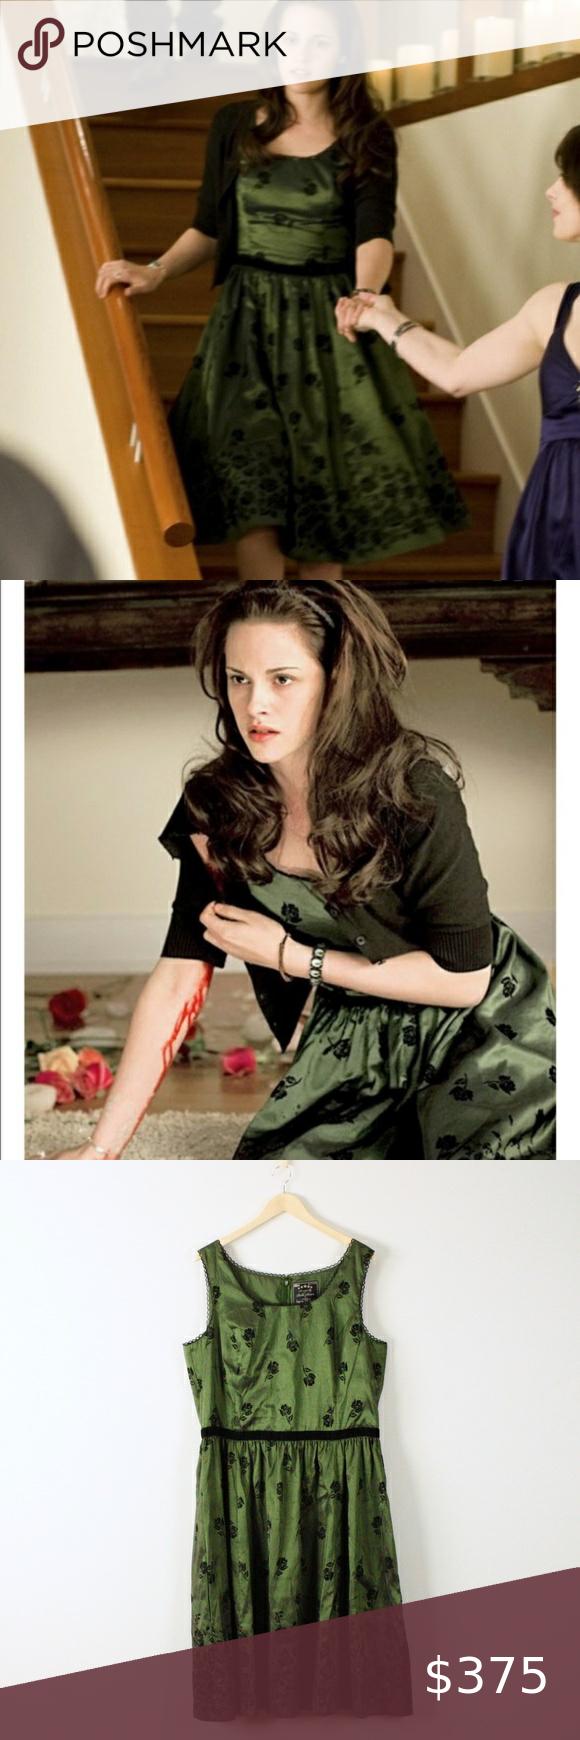 Nwt Bella Swan New Moon Twilight Birthday Dress Size 2xl As Worn By Bella Swan In The Twilight Sage New Moon Bea Birthday Dresses Shiny Fabric Fashion [ 1740 x 580 Pixel ]